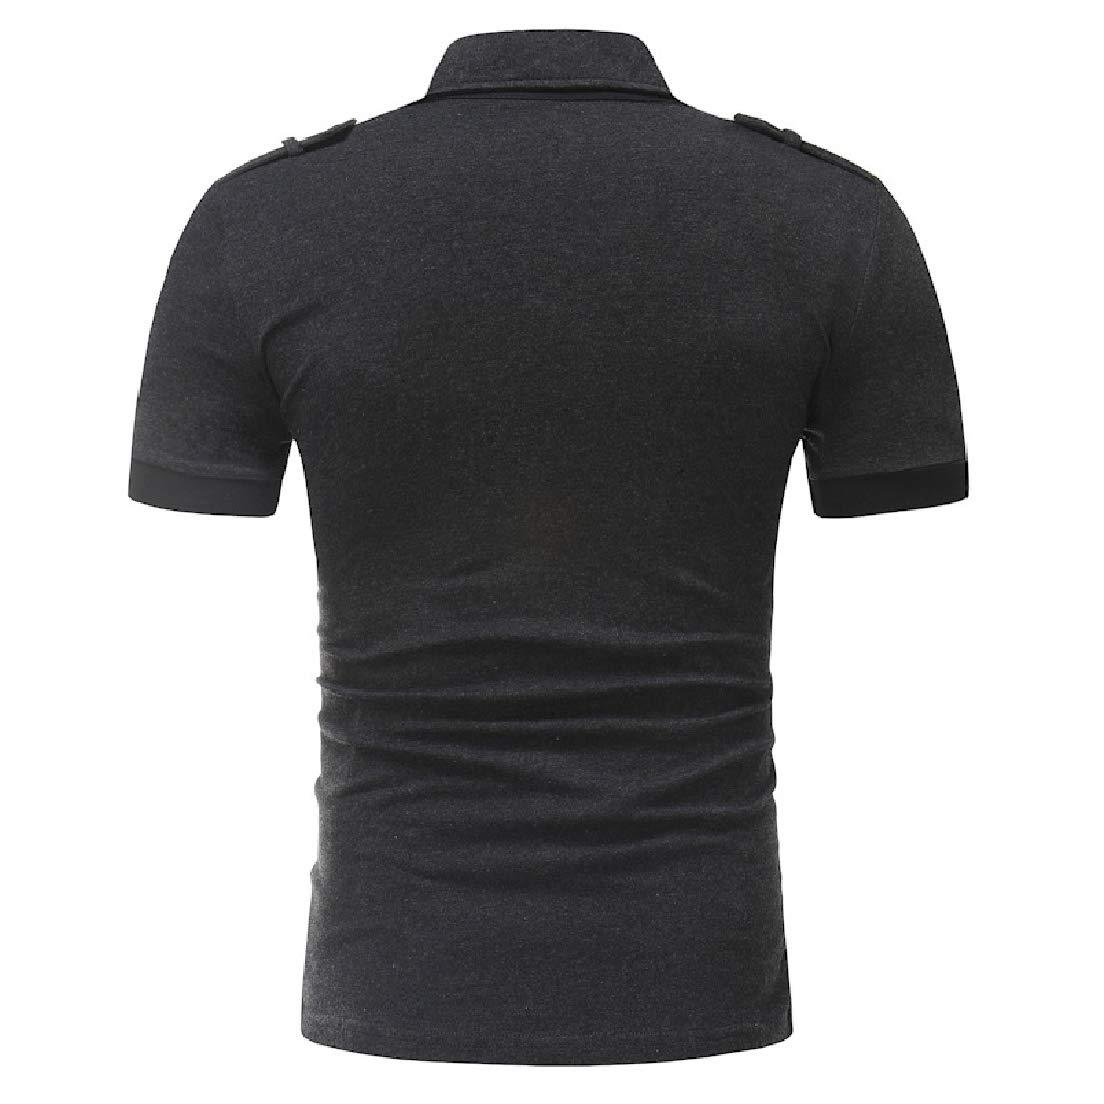 Vska Mens Summer Solid Turn Down Collar Button Down Short Sleeve Tee Shirt Tunic